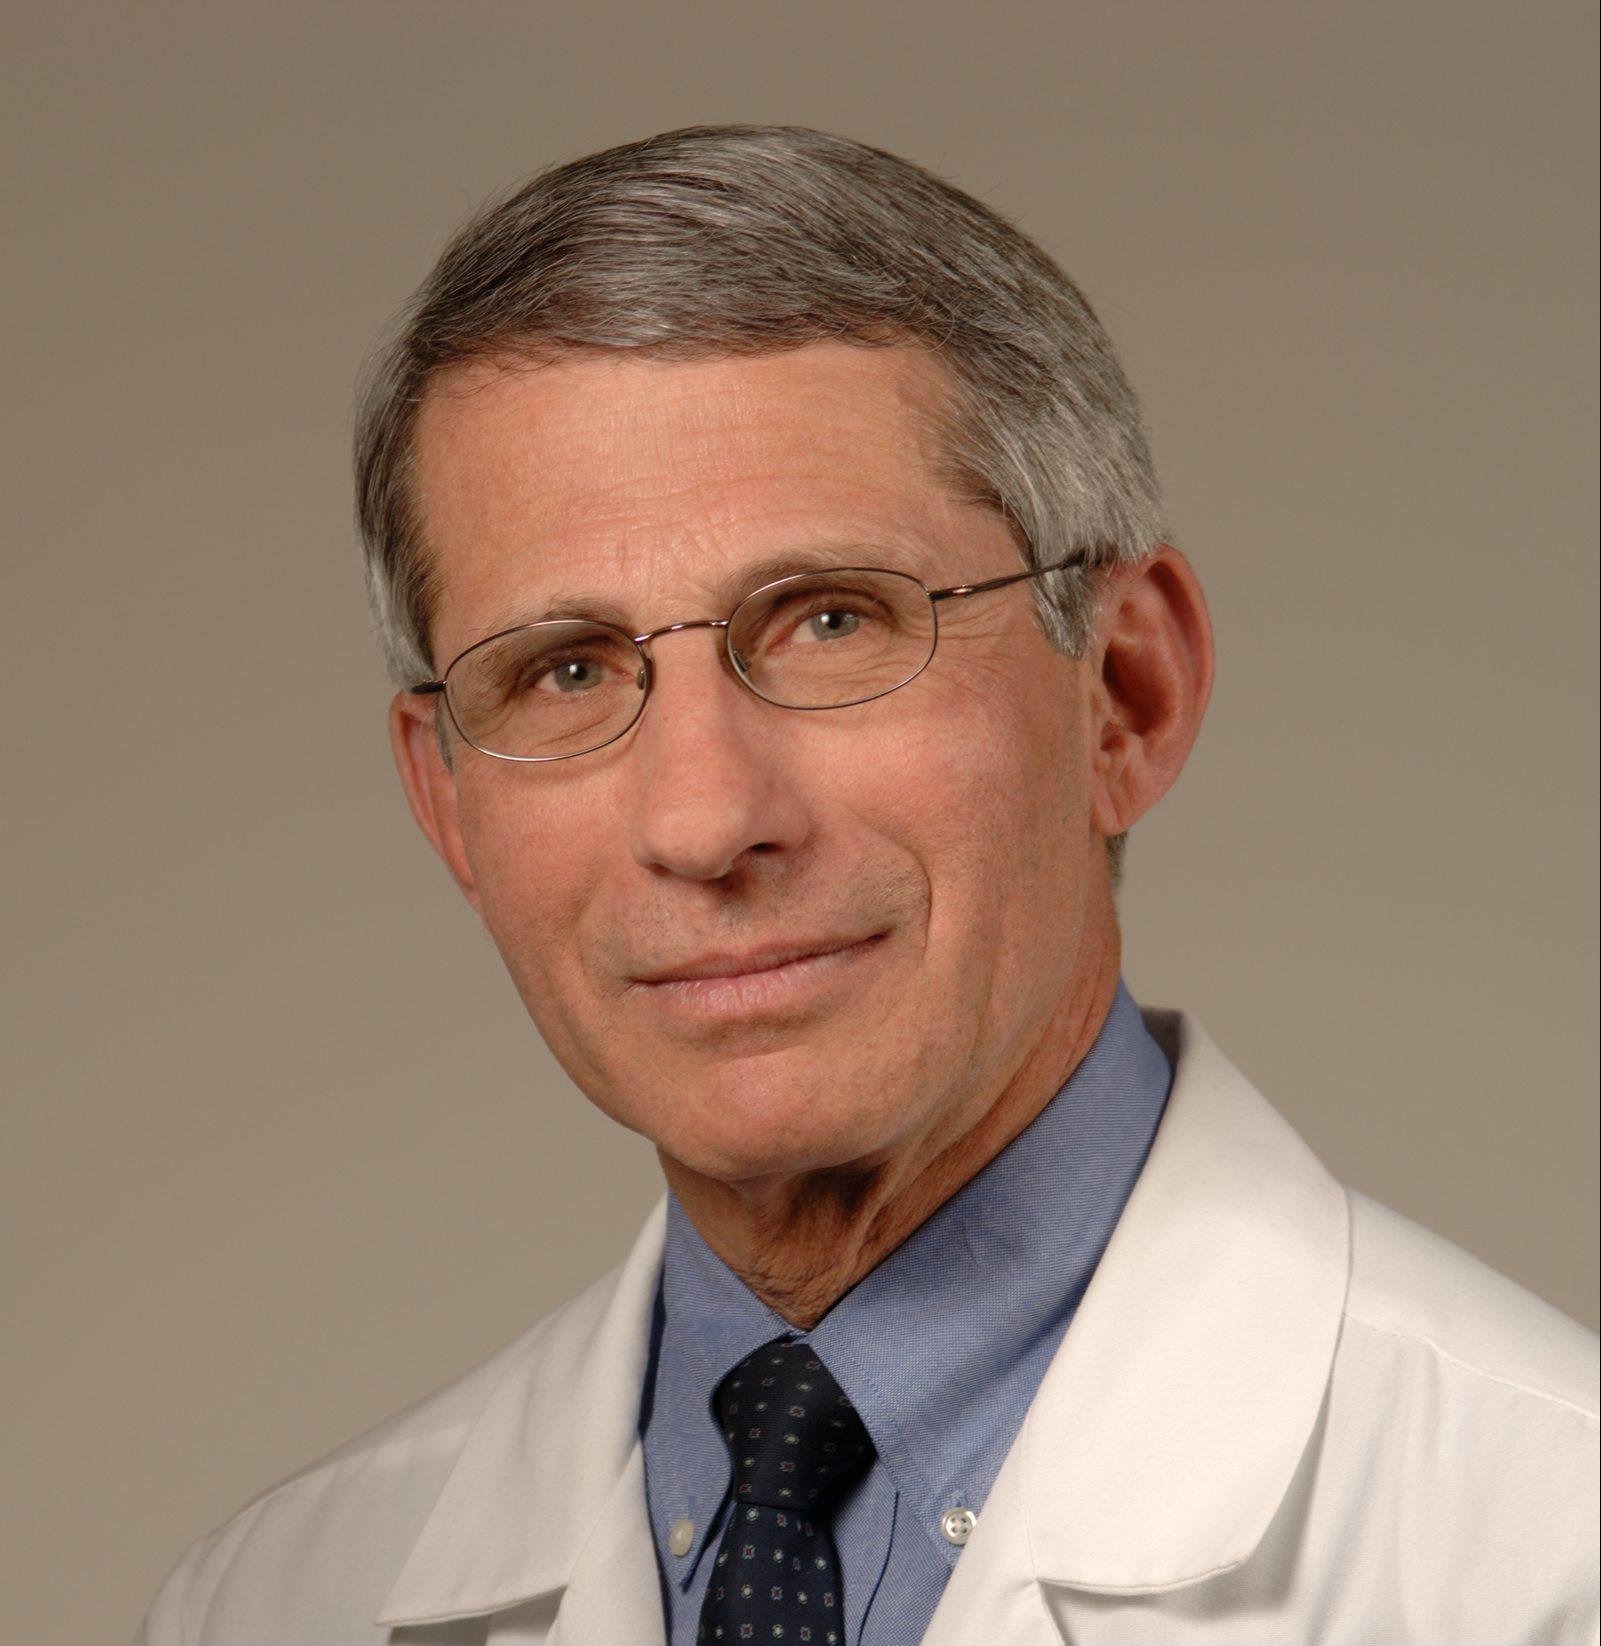 Anthony Fauci - Chief Medical Advisor